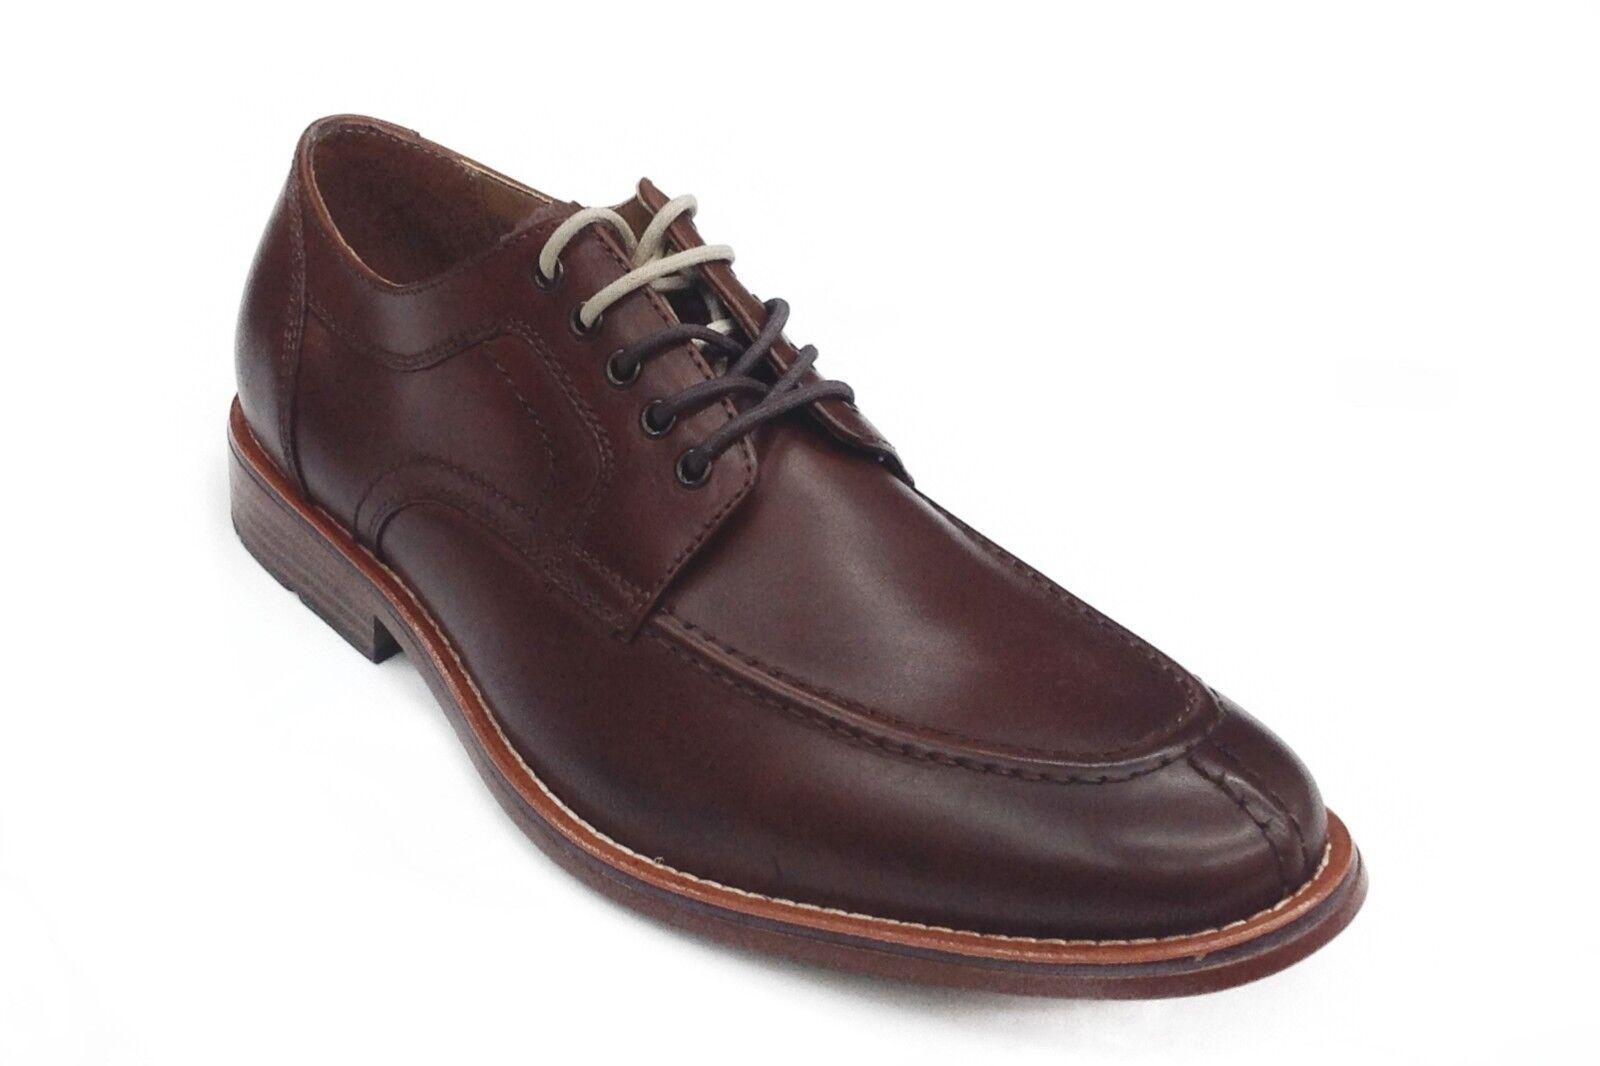 Uomo Bass Usa Pelle Dress shoes Split Toe Oxford 70-80172 Carsen British Tan